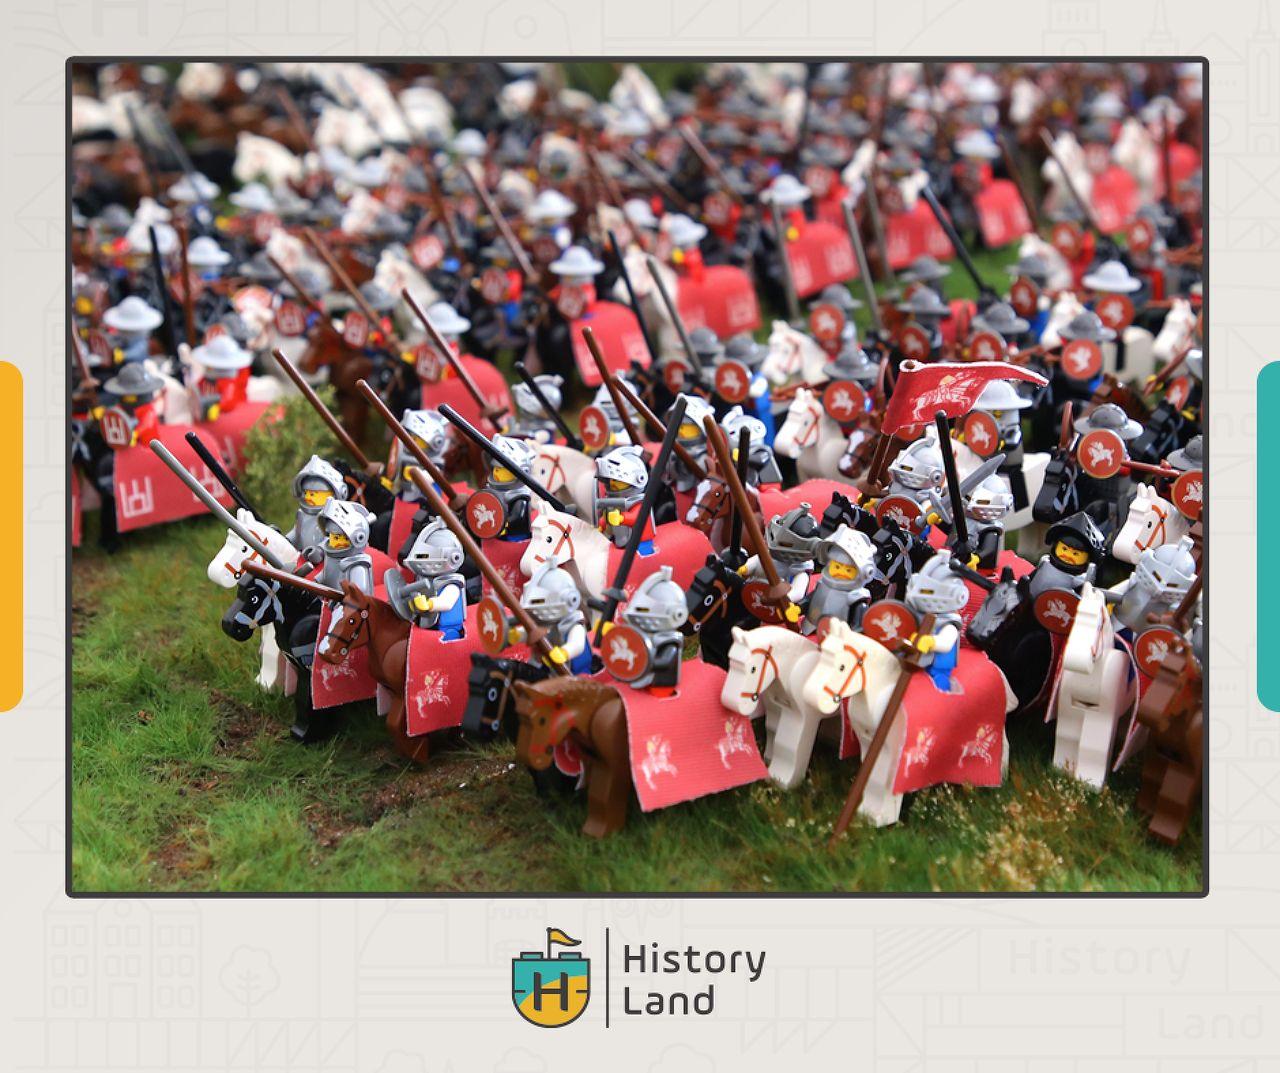 Photo 1 of History Land